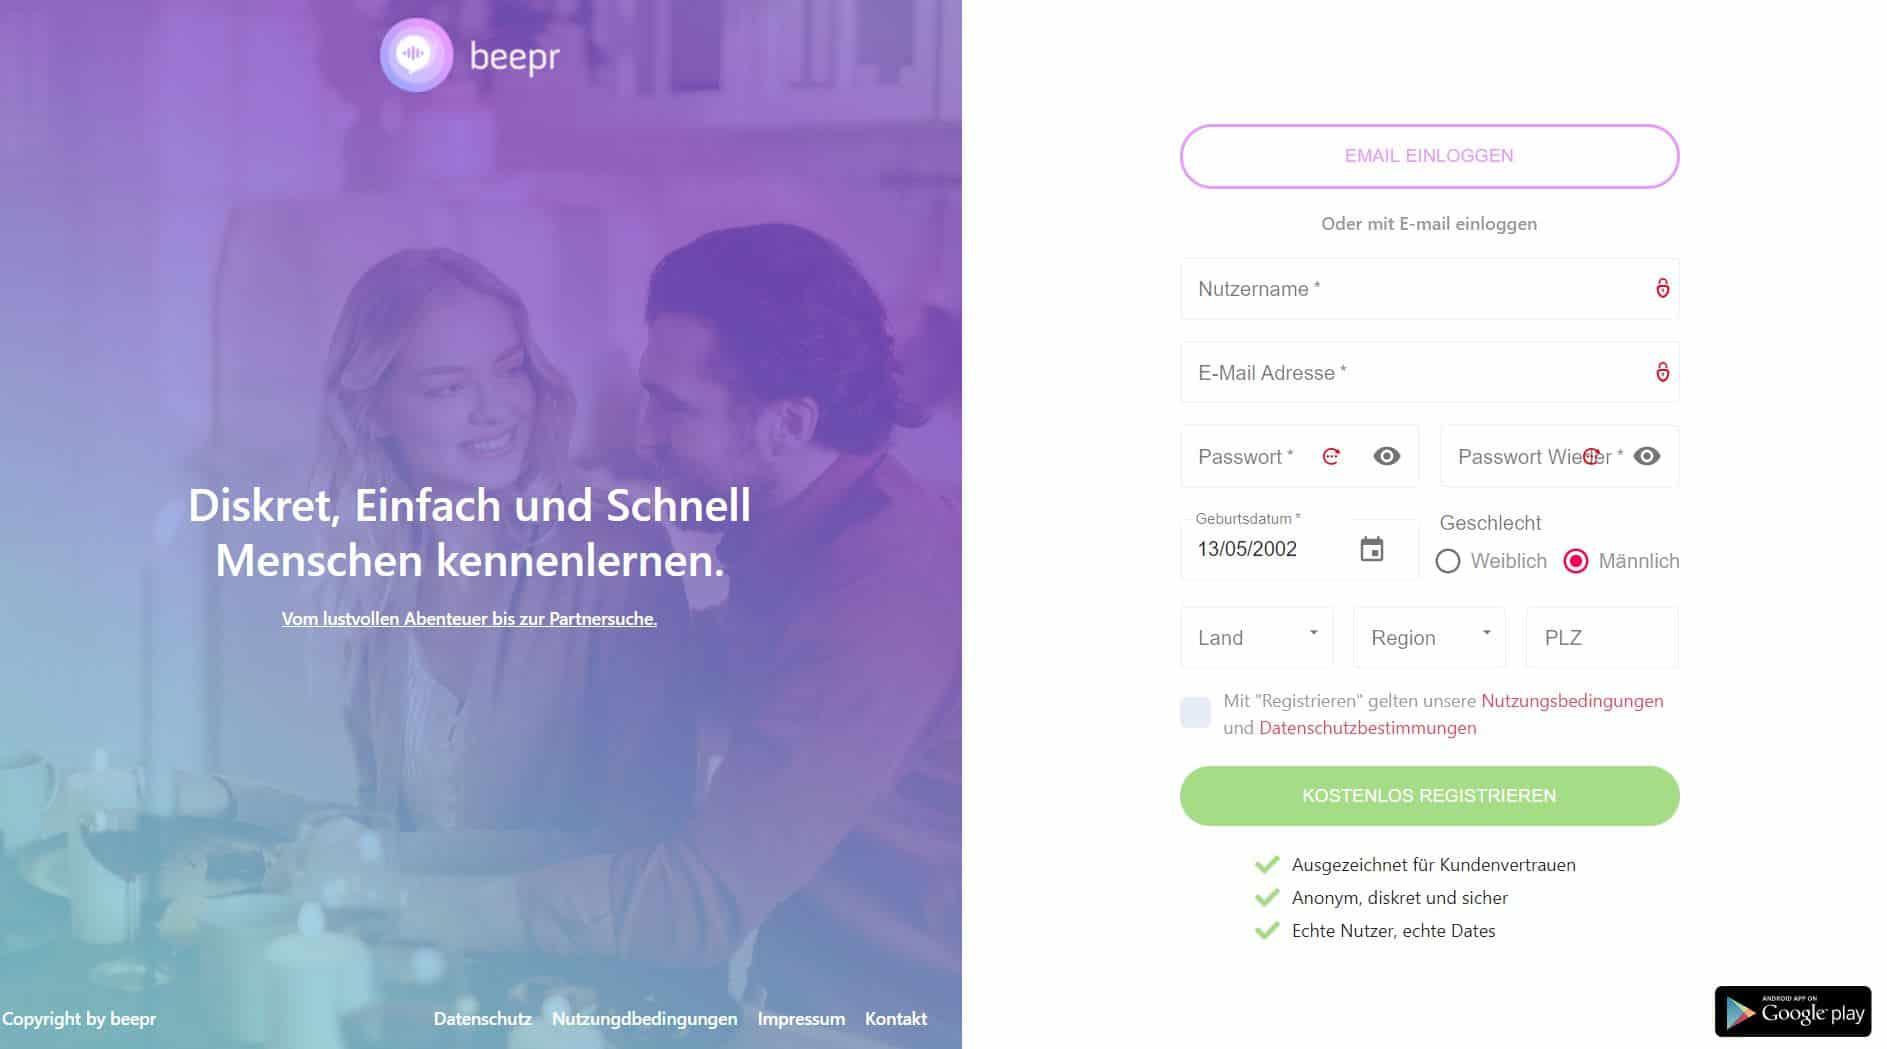 Testbericht: Beepr.de Abzocke